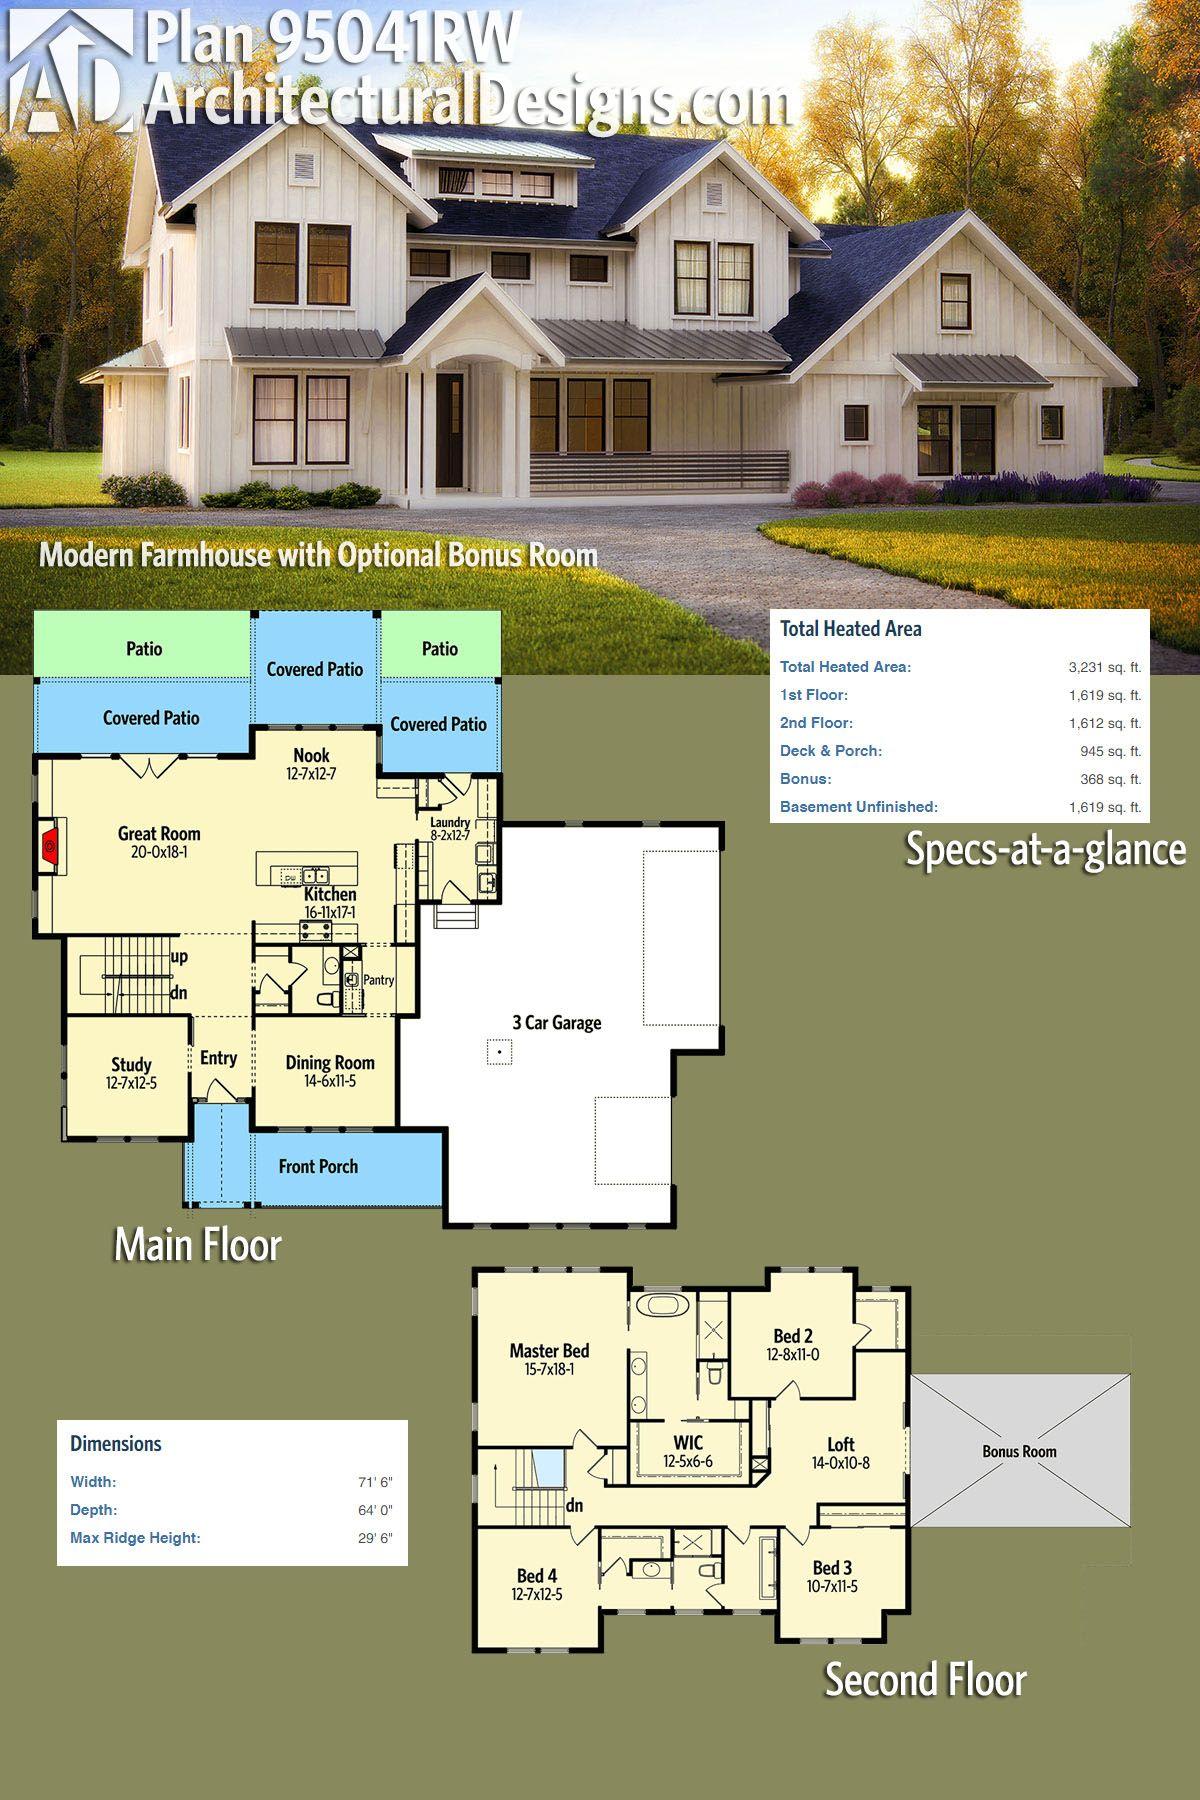 Architectural Designs Modern Farmhouse Plan 95041RW gives